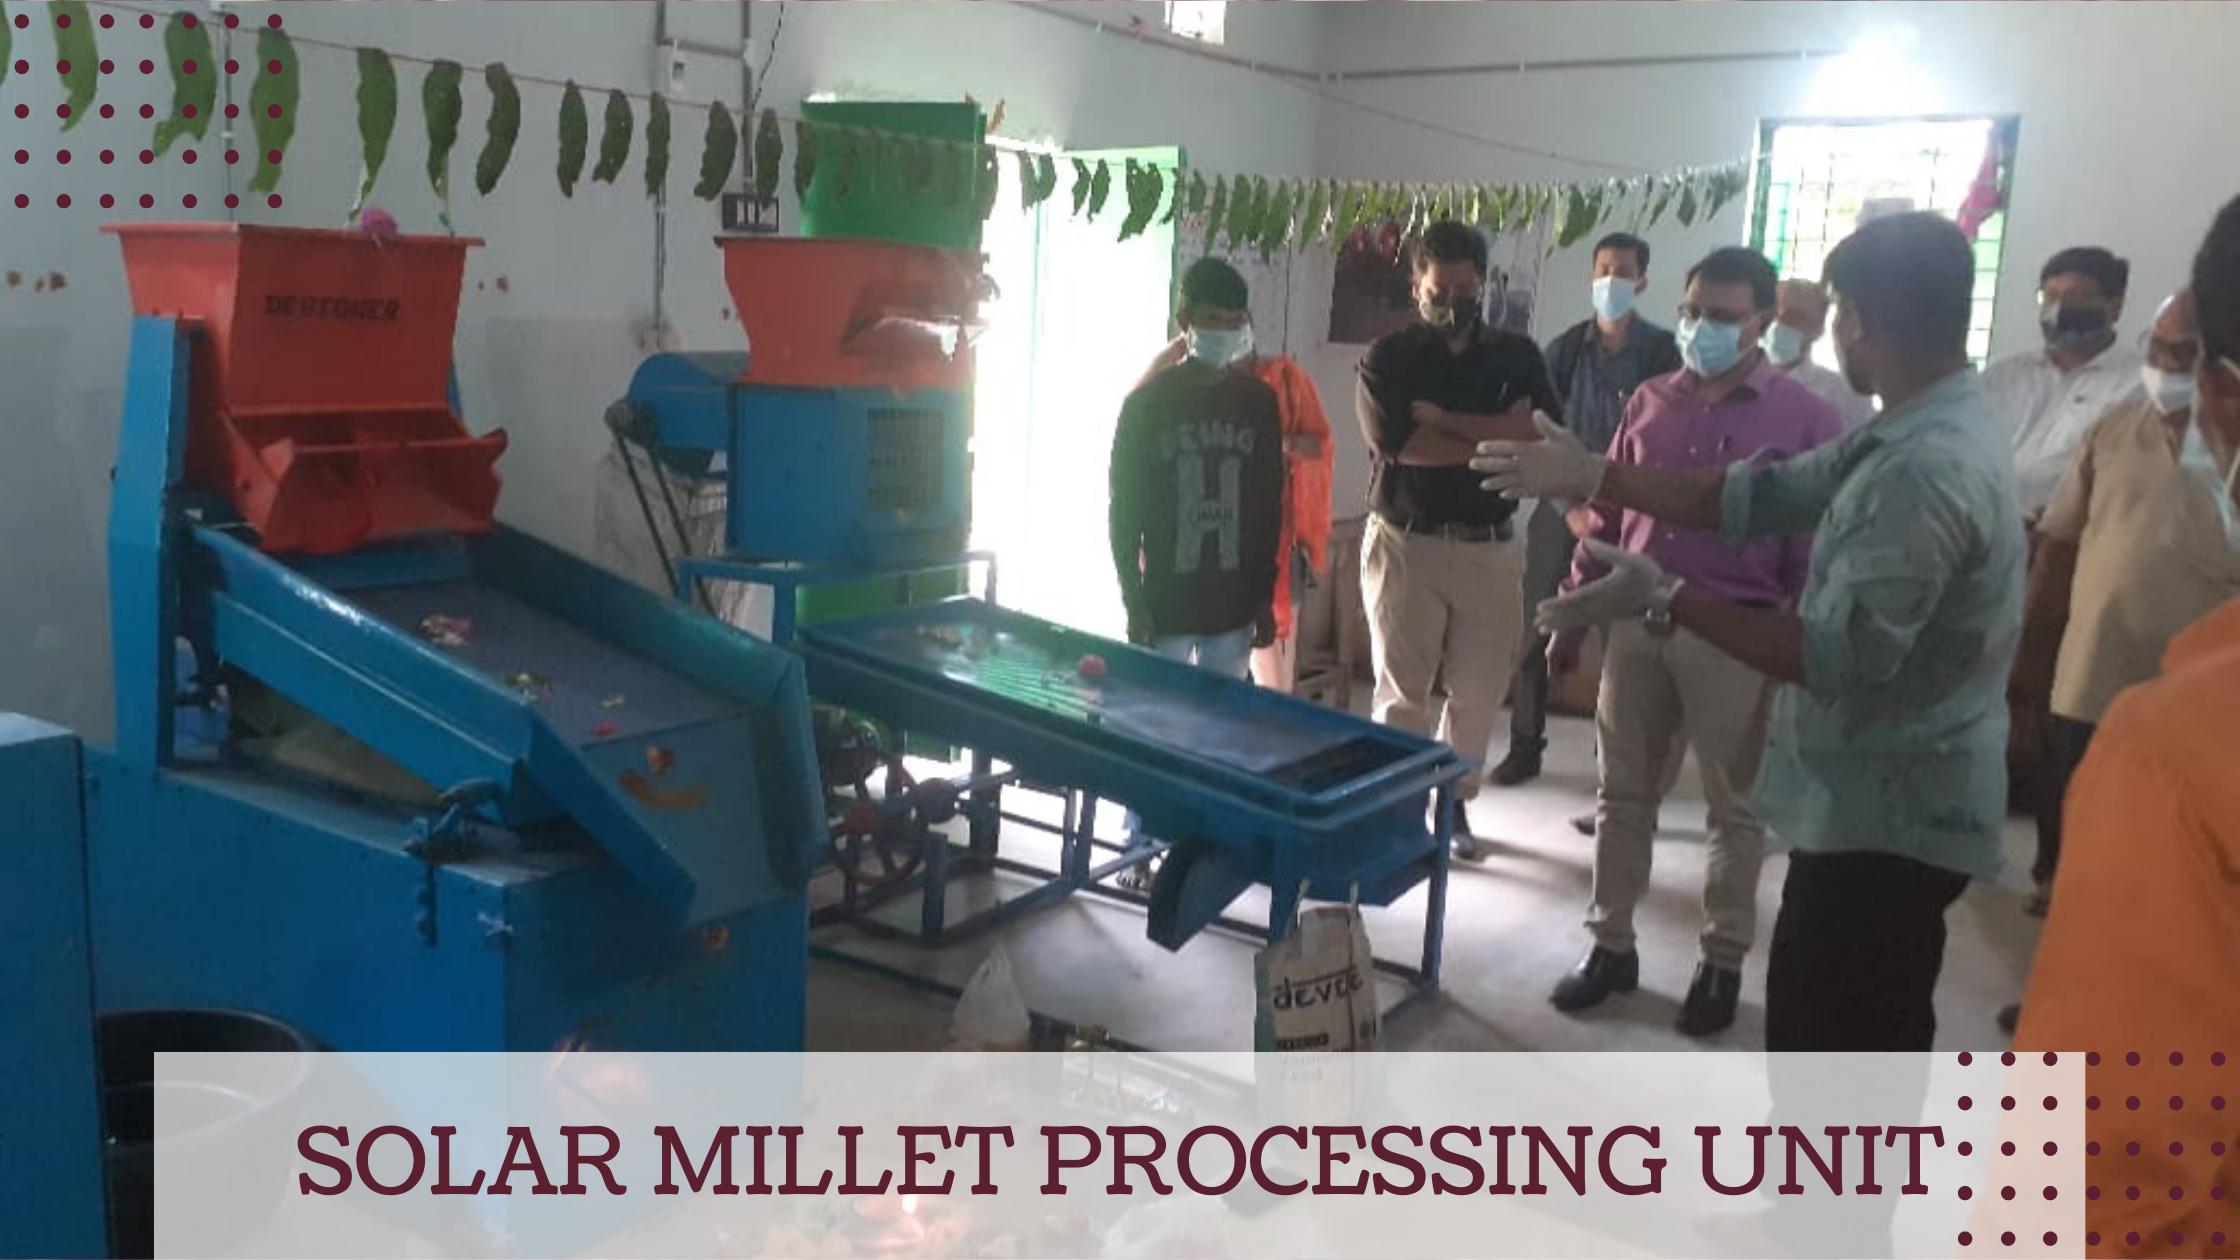 Solar Millet Processing Unit